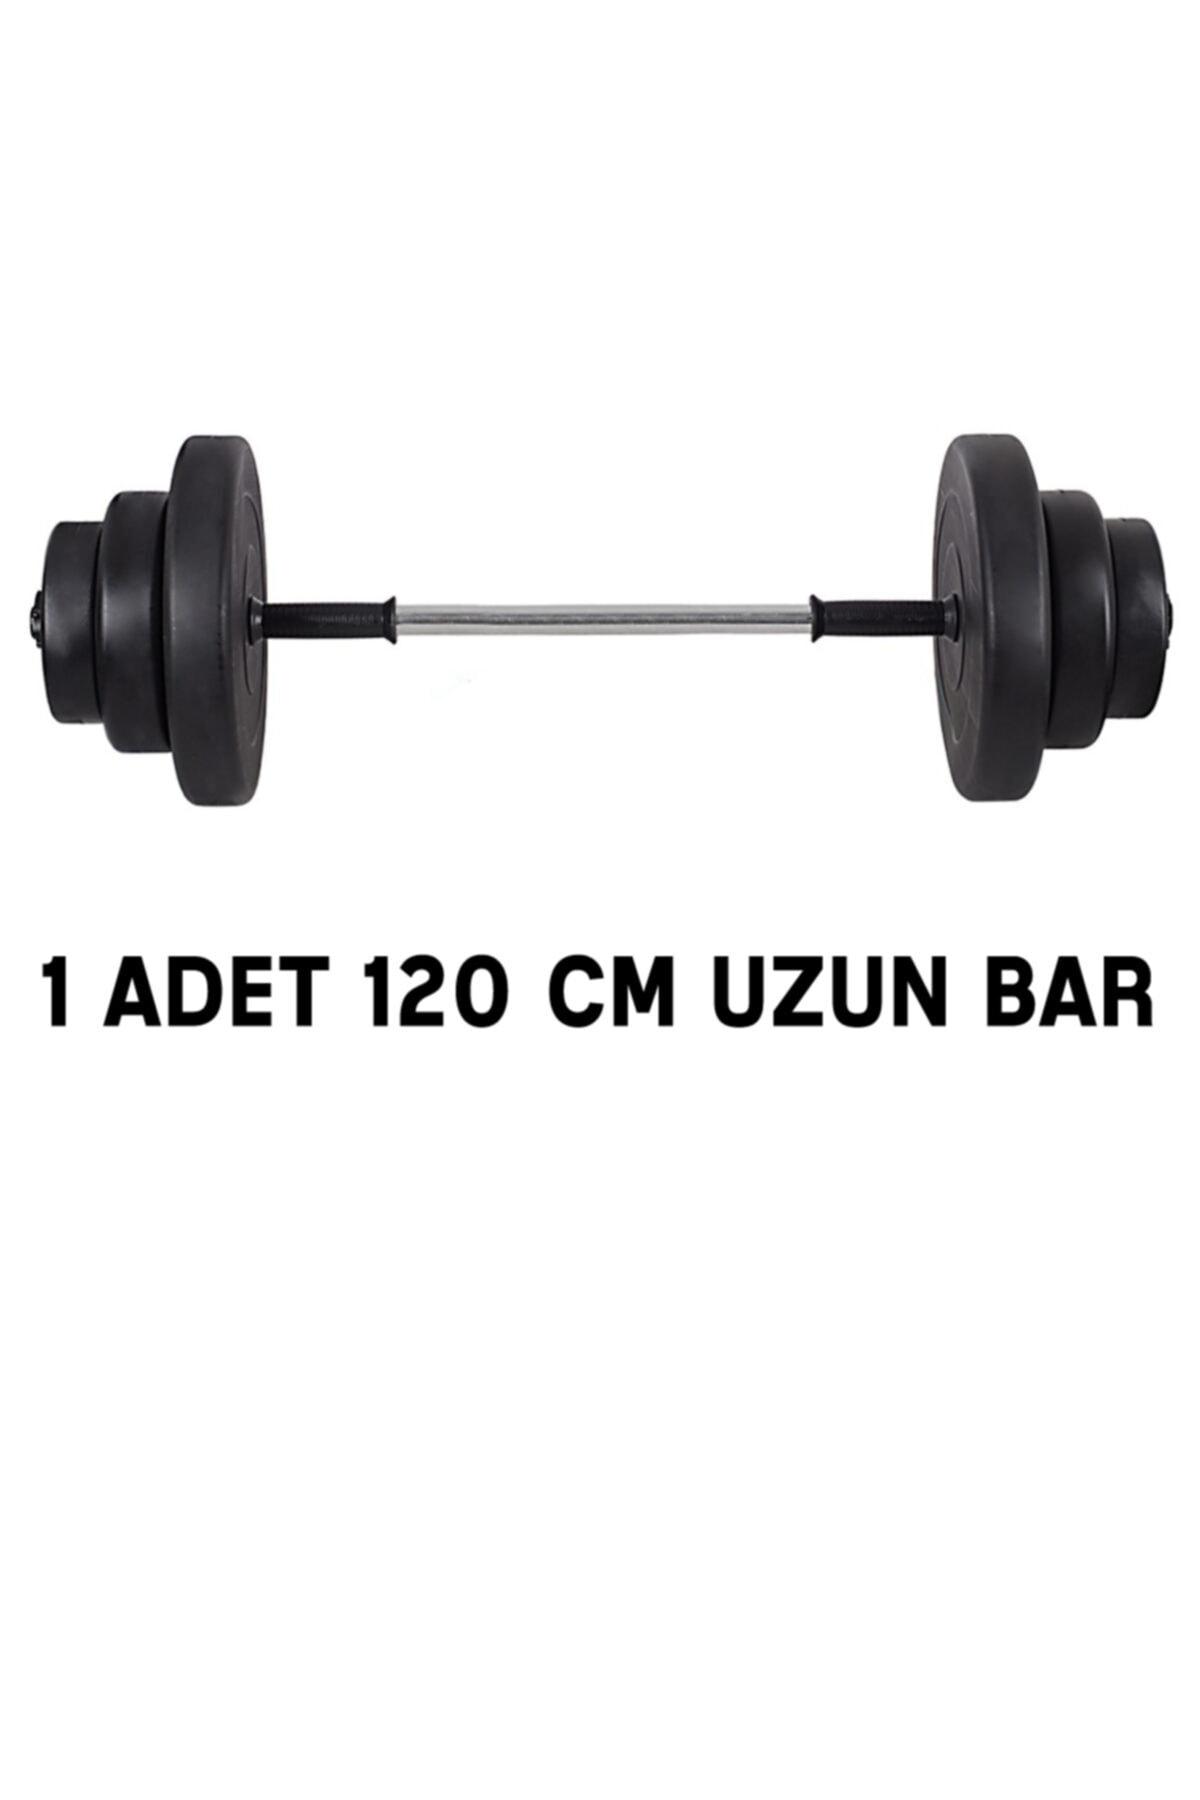 ECG Spor 22 Kg Halter Seti - Deadlift Squat Biceps Triceps Shoulder